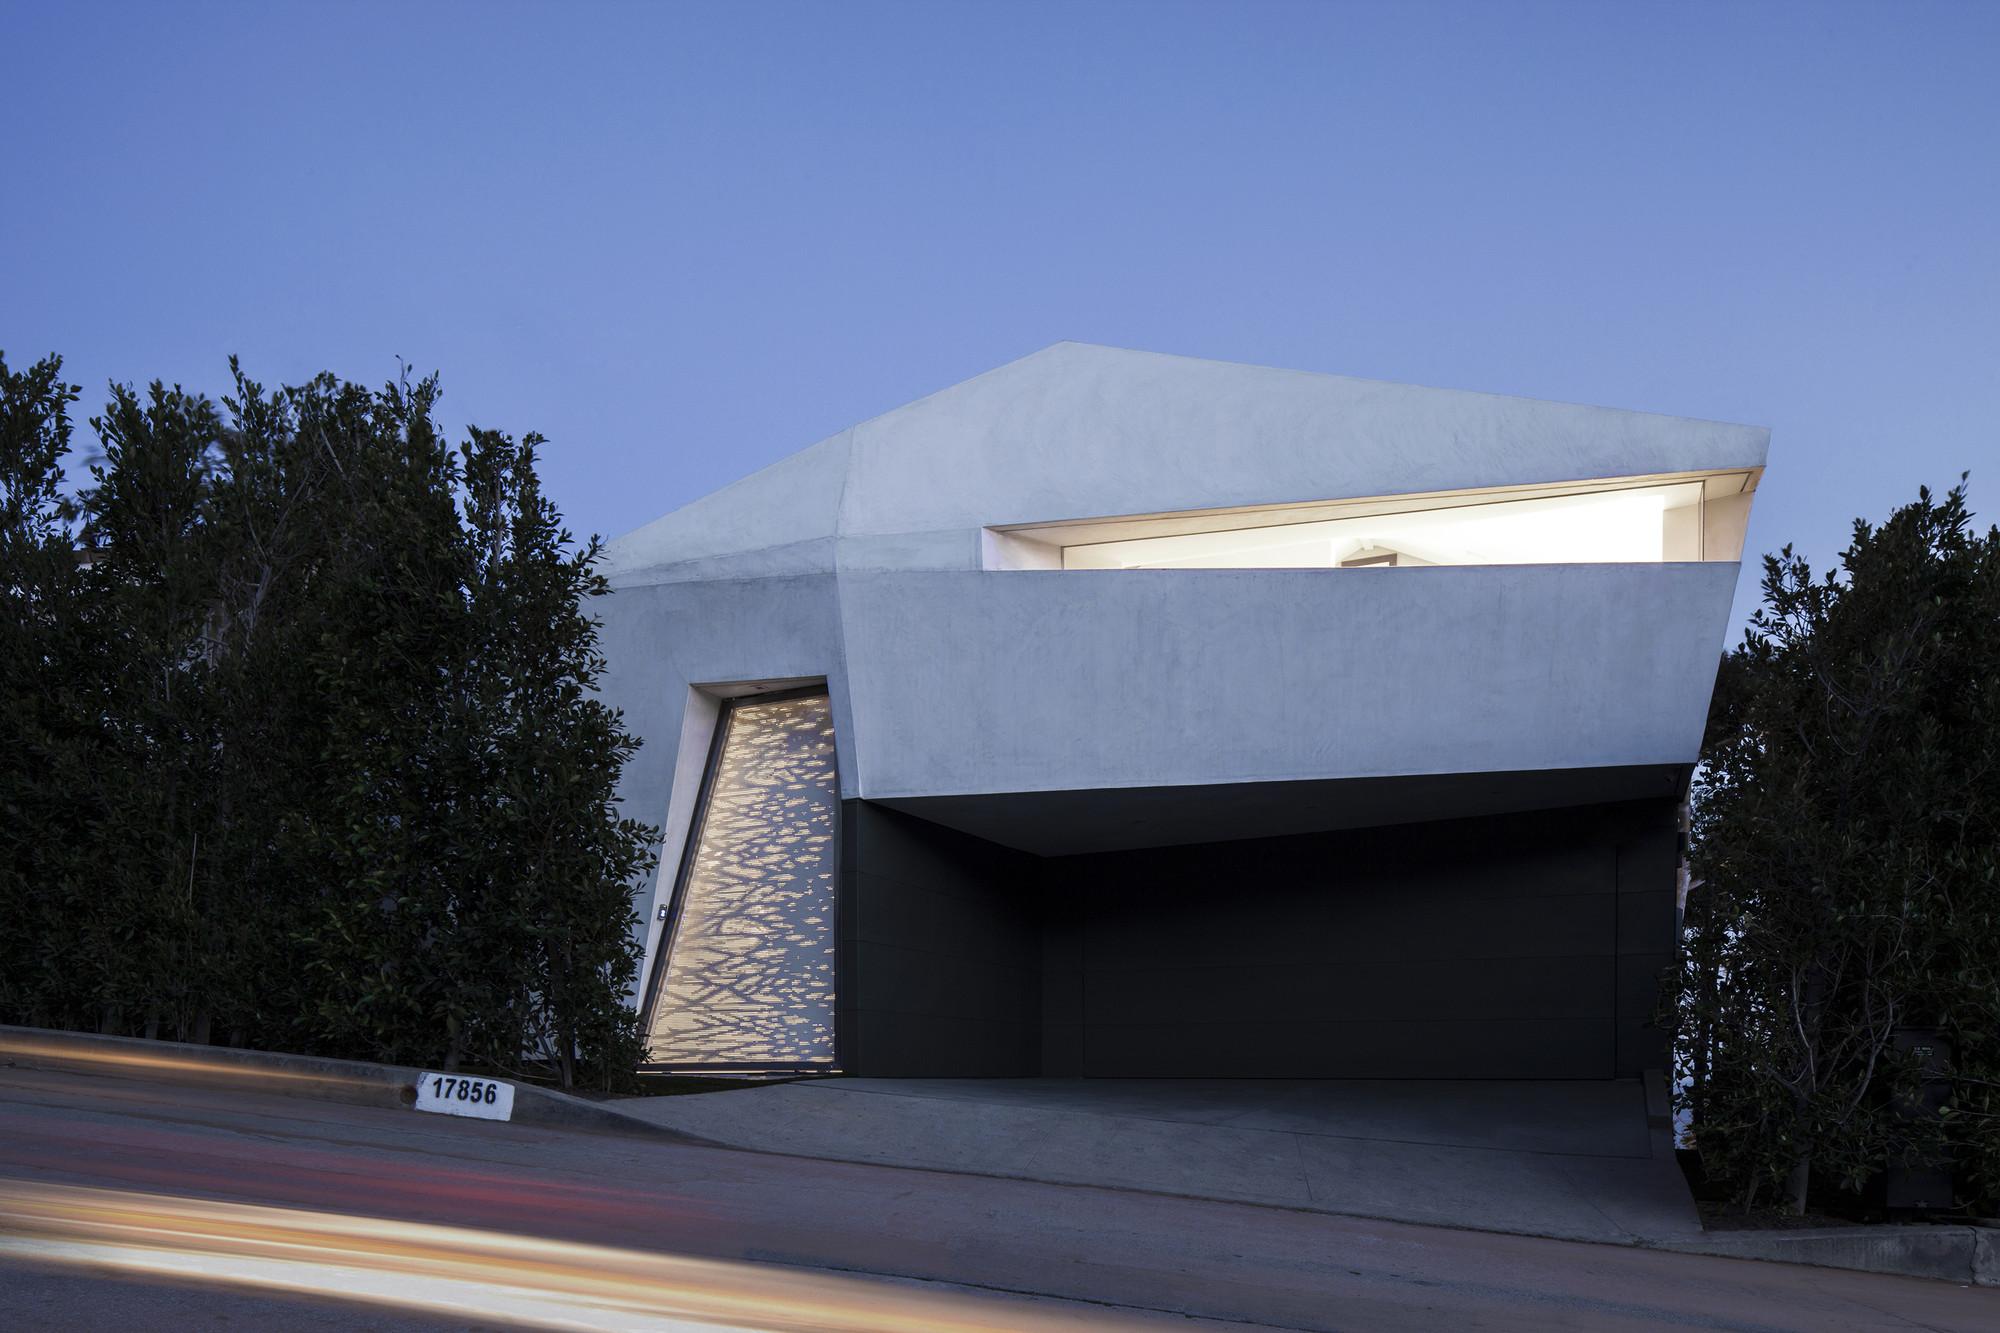 Residencia Montee Karp / Patrick Tighe Architecture, © Art Gray Photography